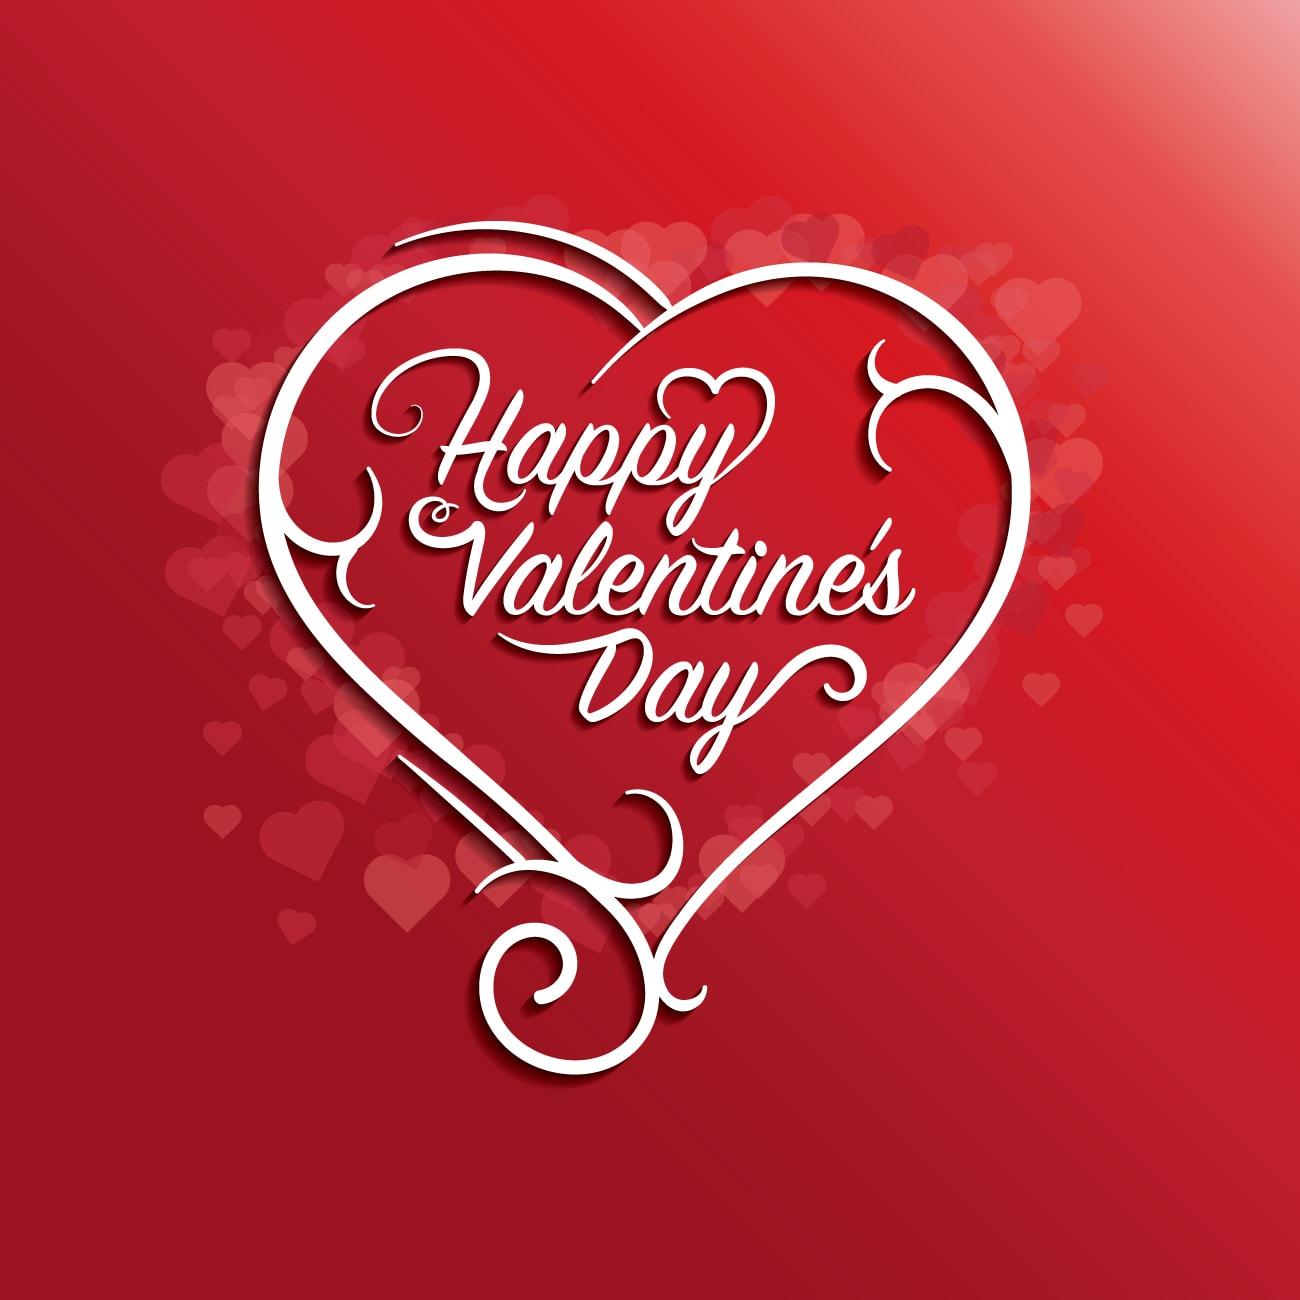 Wallpaper download valentine day - Happy Valentines Day Images Download